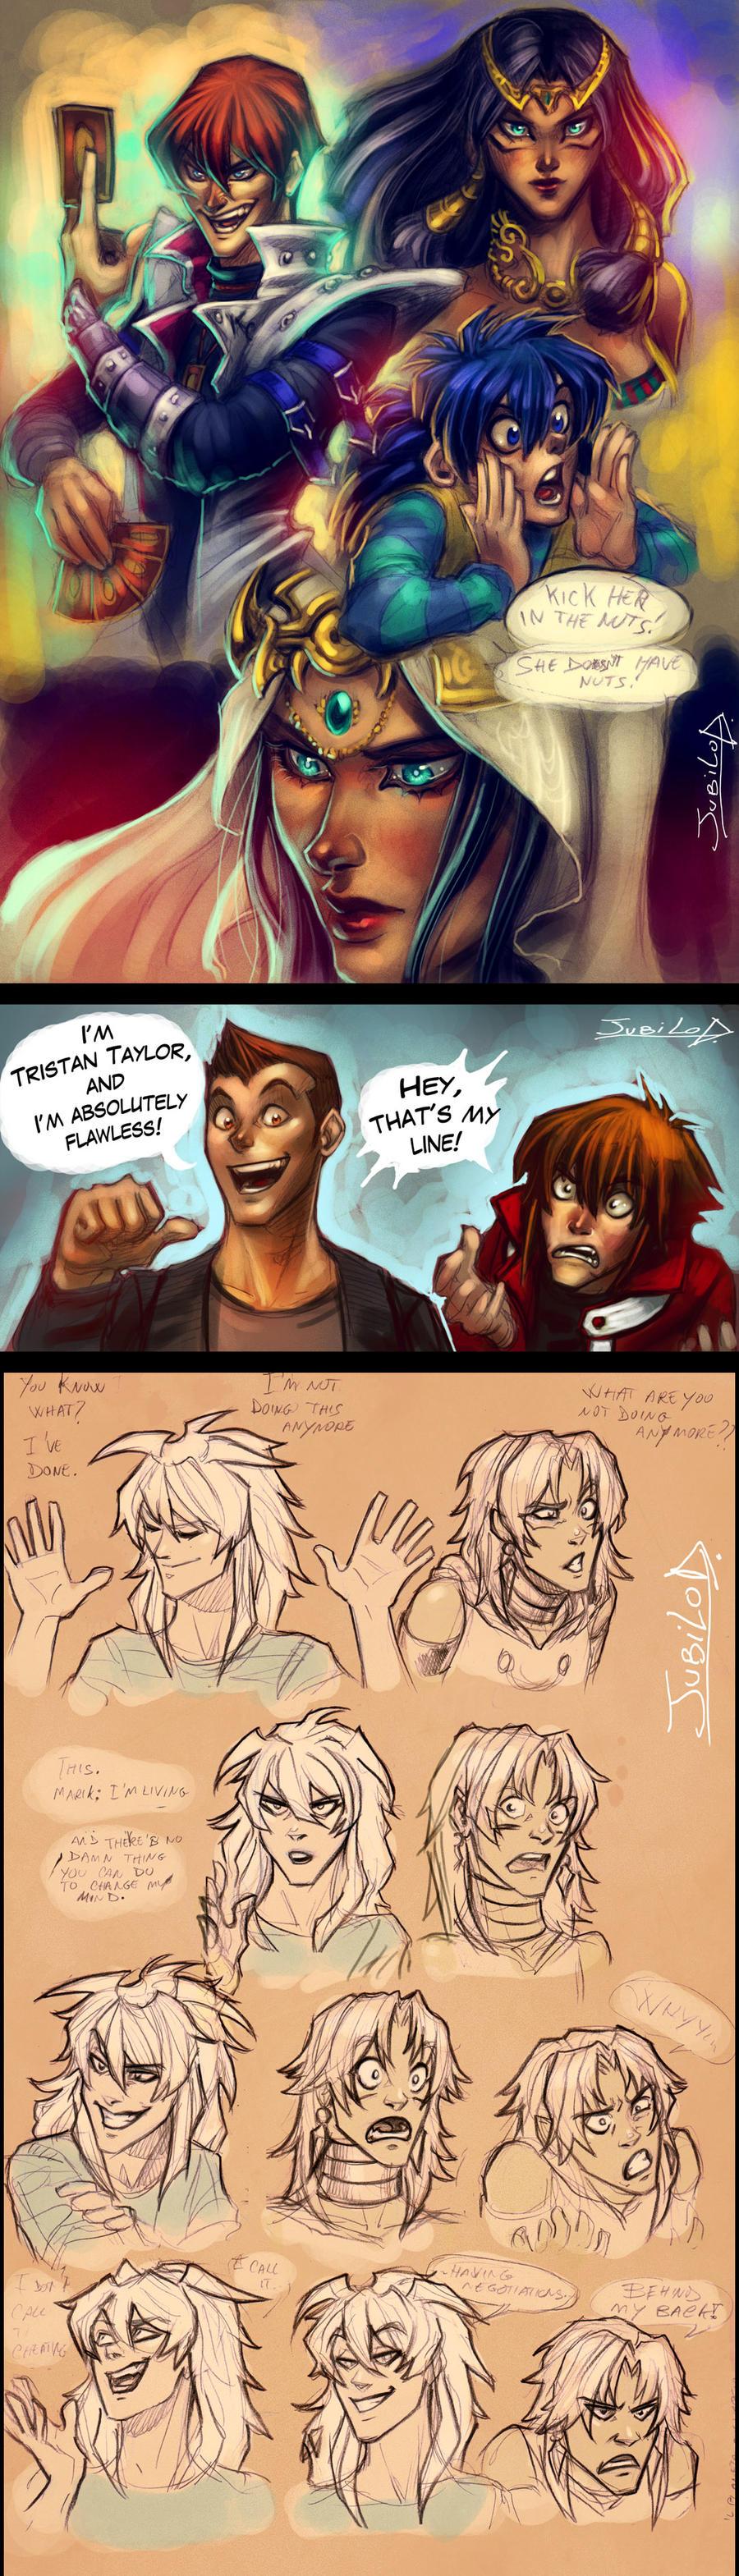 Ishizu Explains It All and Marik evil council 5 by Rivan145th